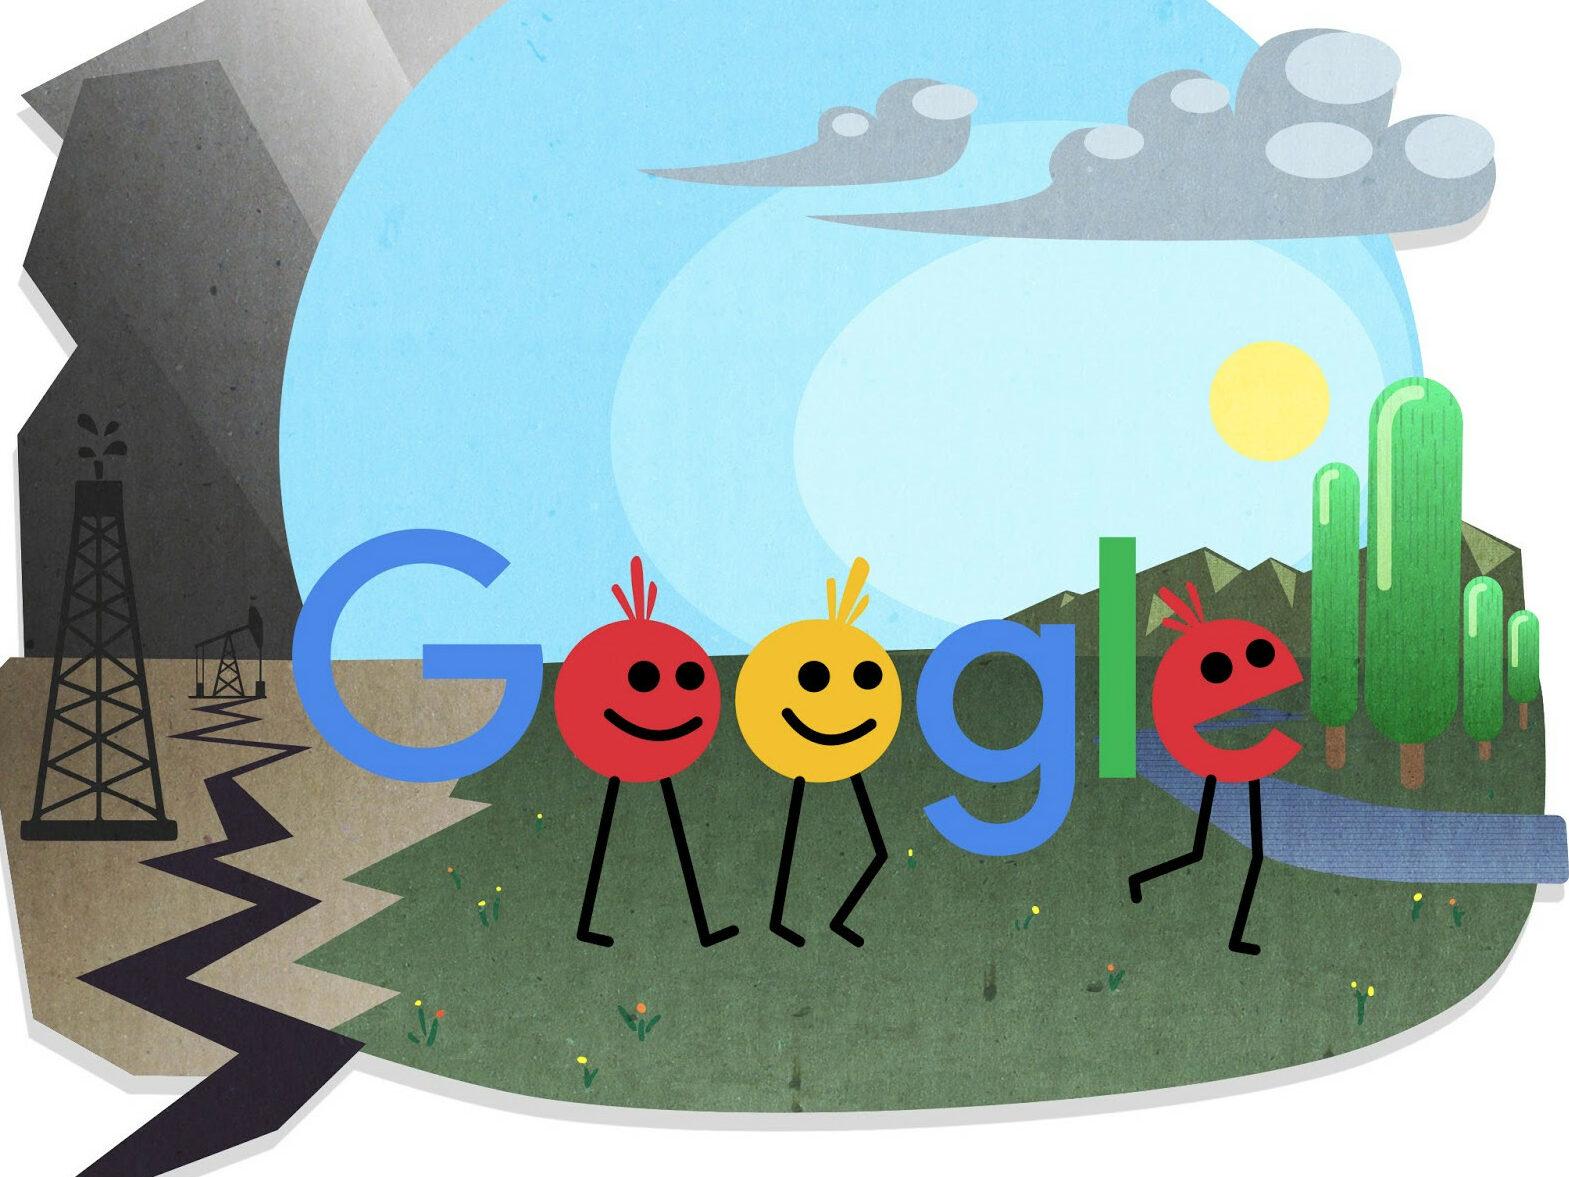 Google's Future: is it green?